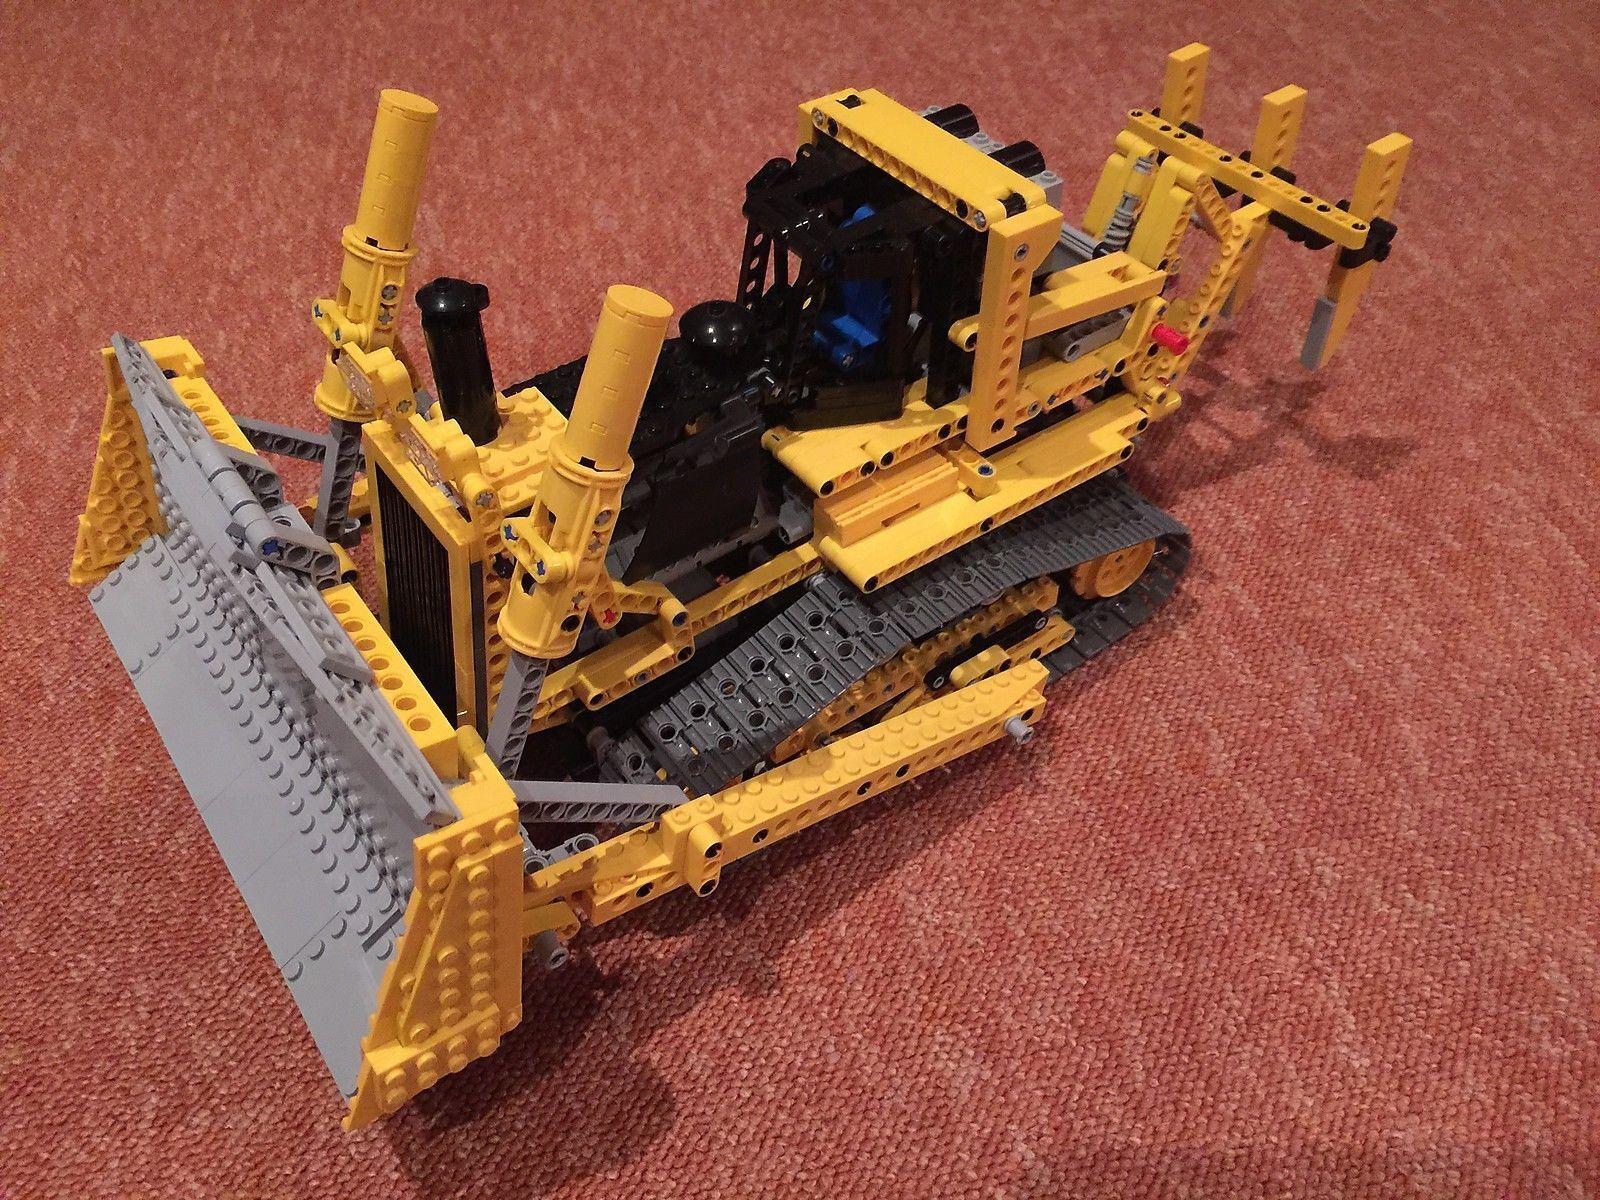 Lego Technic RC 8275 Bulldozer mit Power Funktion BA (passt zu 8043 42030)